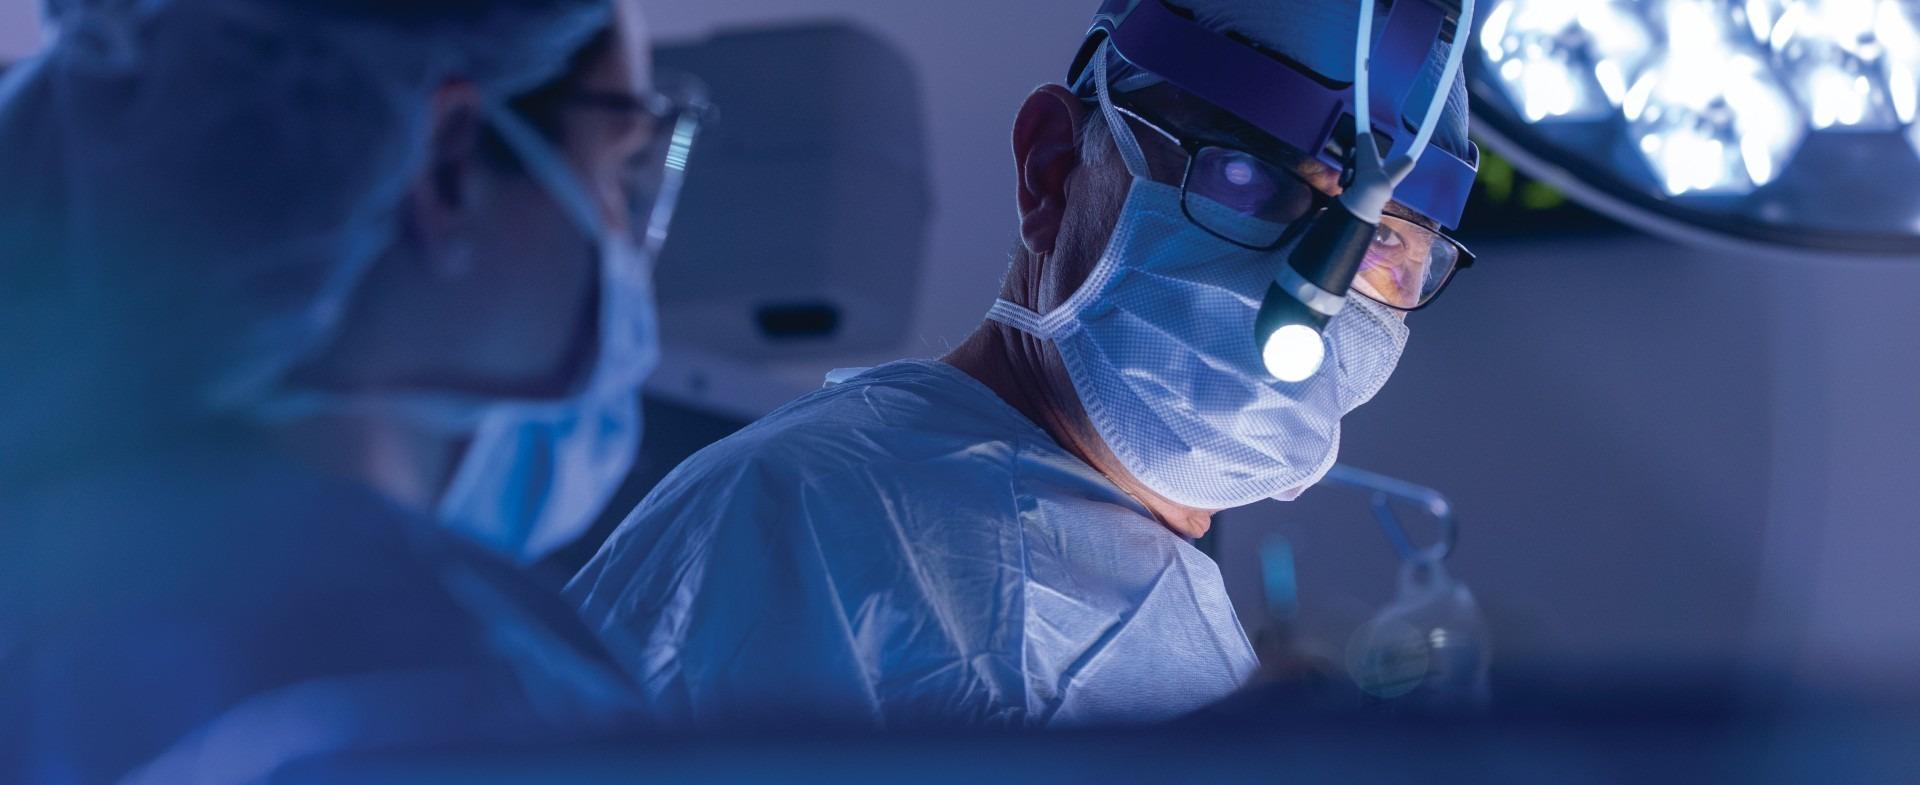 close up image of a TGH surgeon